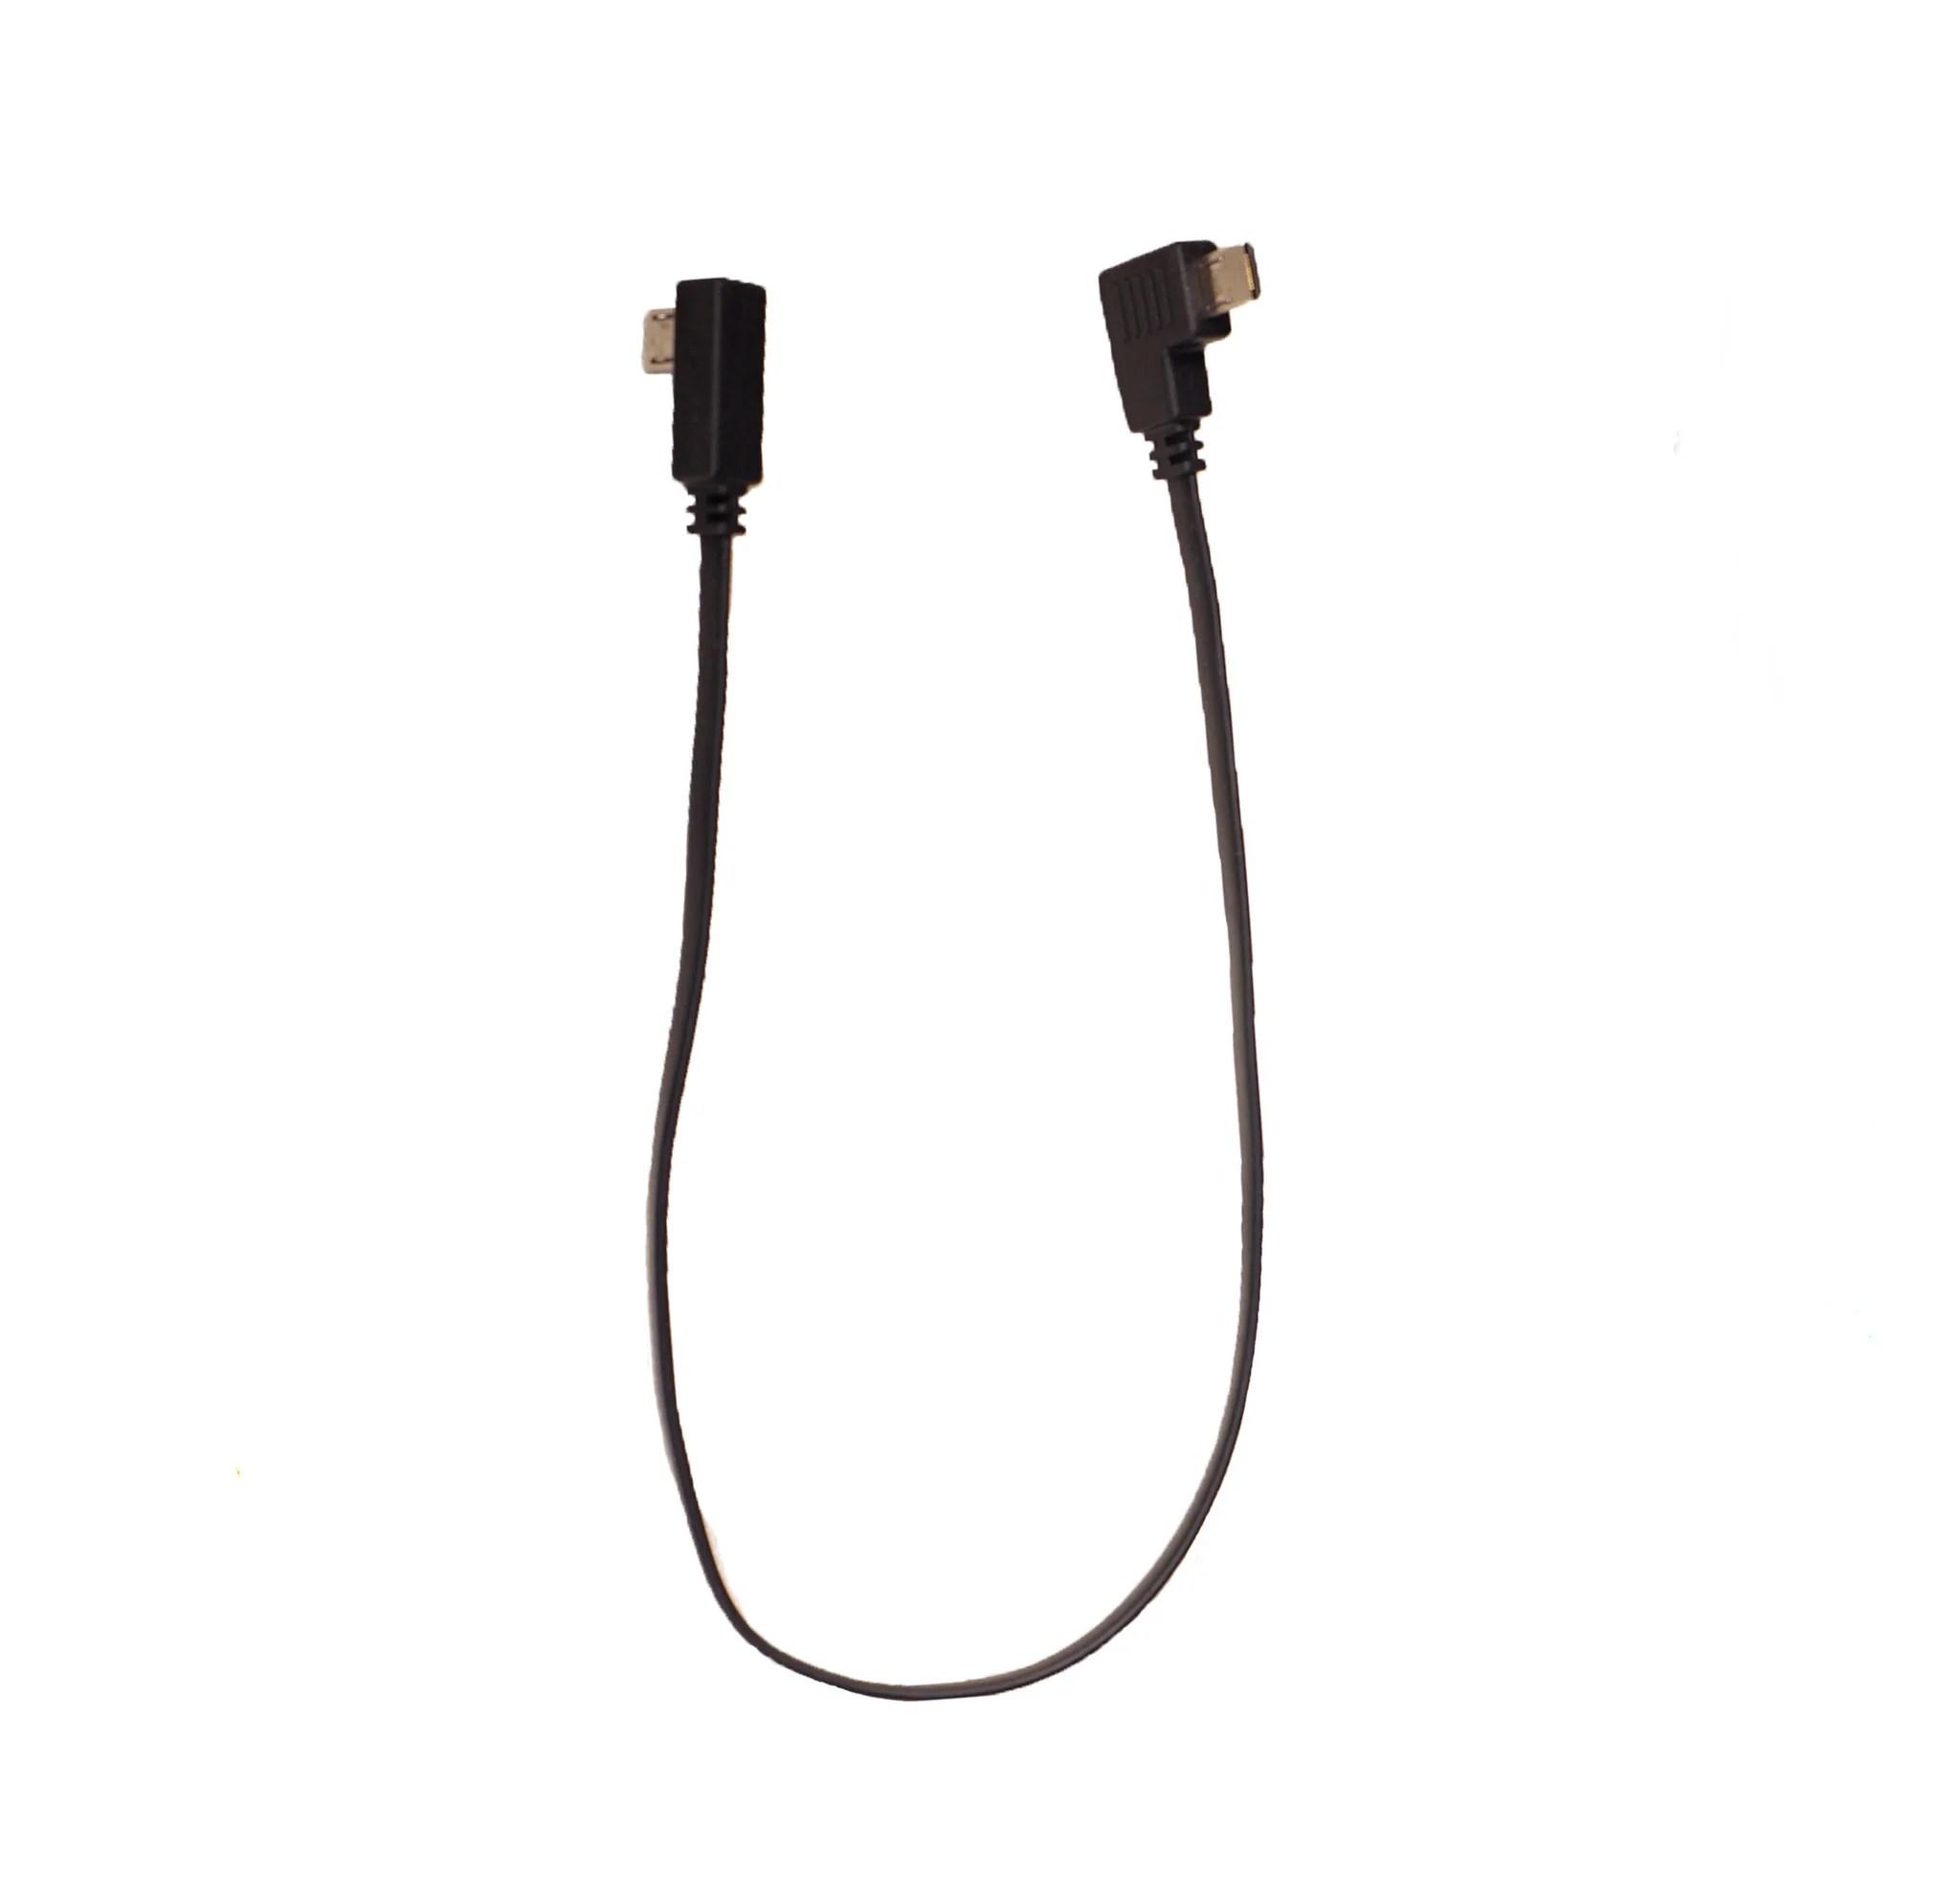 zhiyun camera connection cable [ 2048 x 1982 Pixel ]